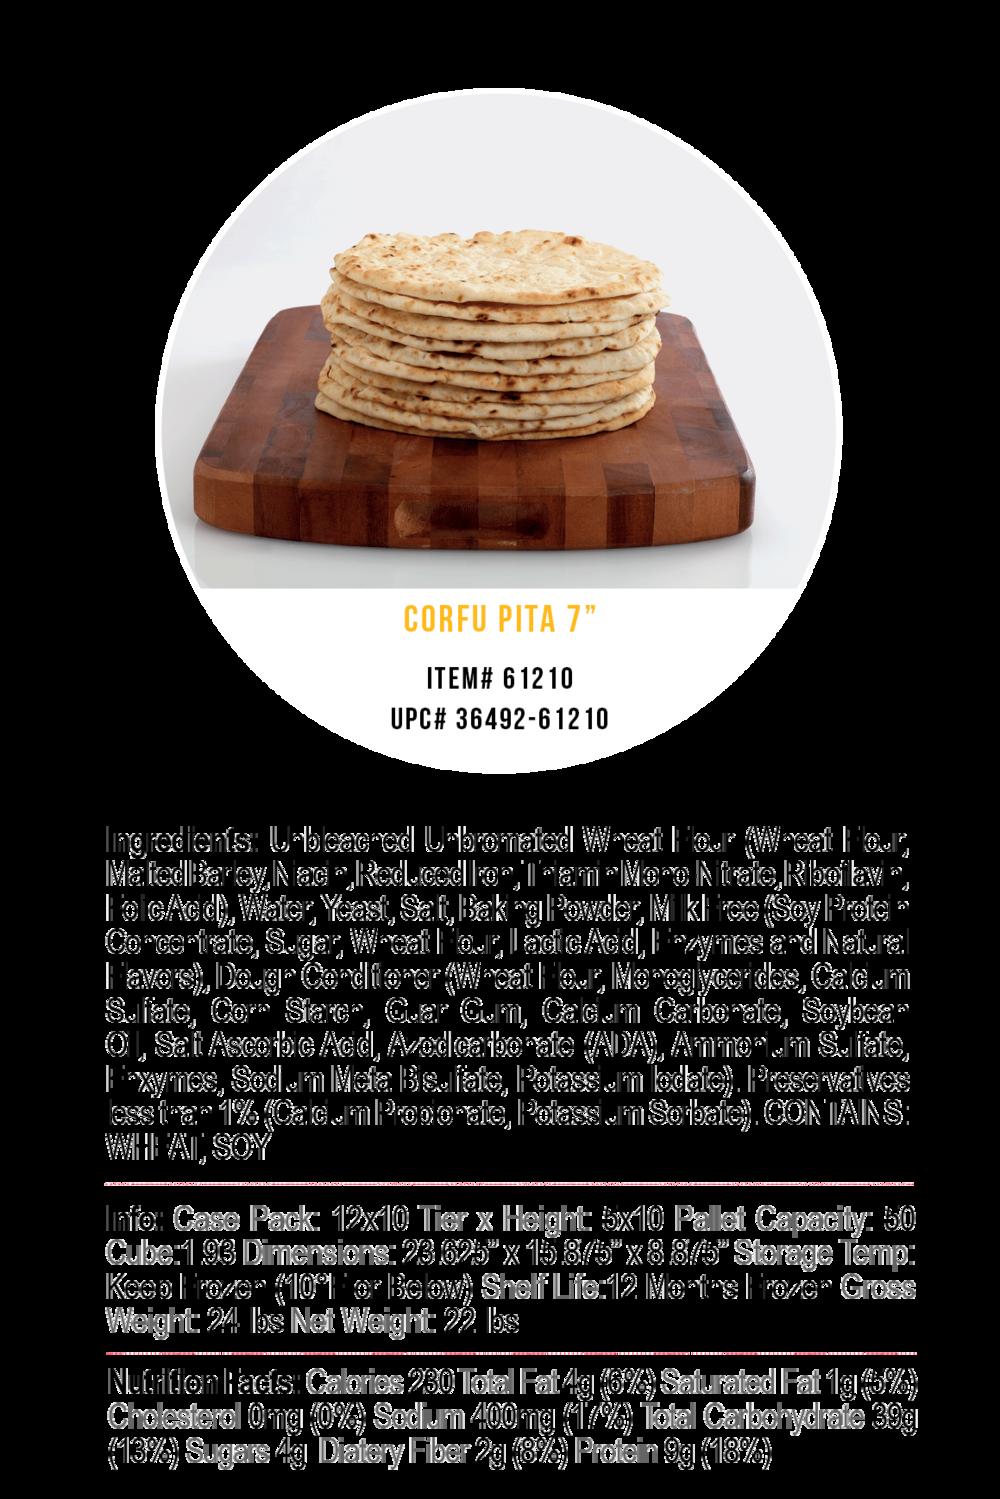 corfu-pita-breads-7 in.png